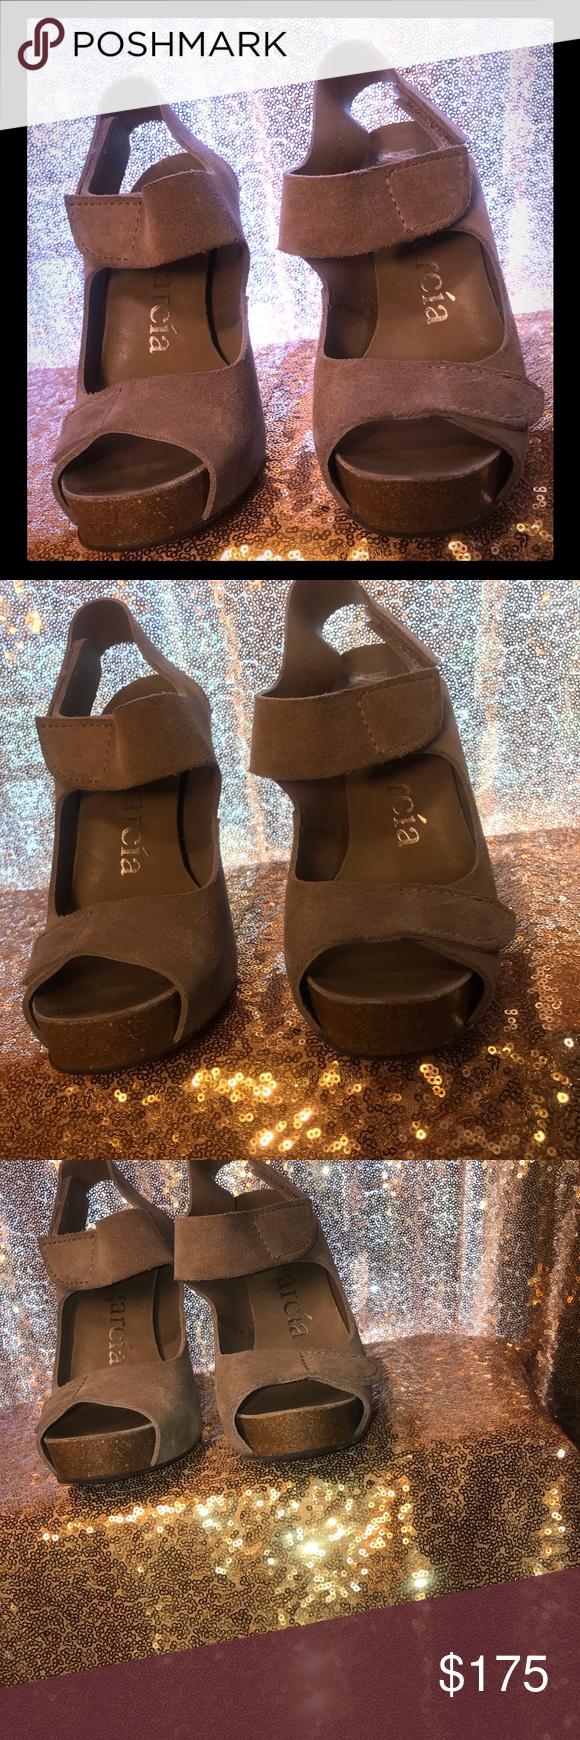 1a5a214e20132 Pedro Gracia Women's Tan Suede High Heel Sandal Pedro Gracia Women's Tan  Suede High Heel Sandal Sz.38. Display Shoe. Never Worn. Excellent Condition.